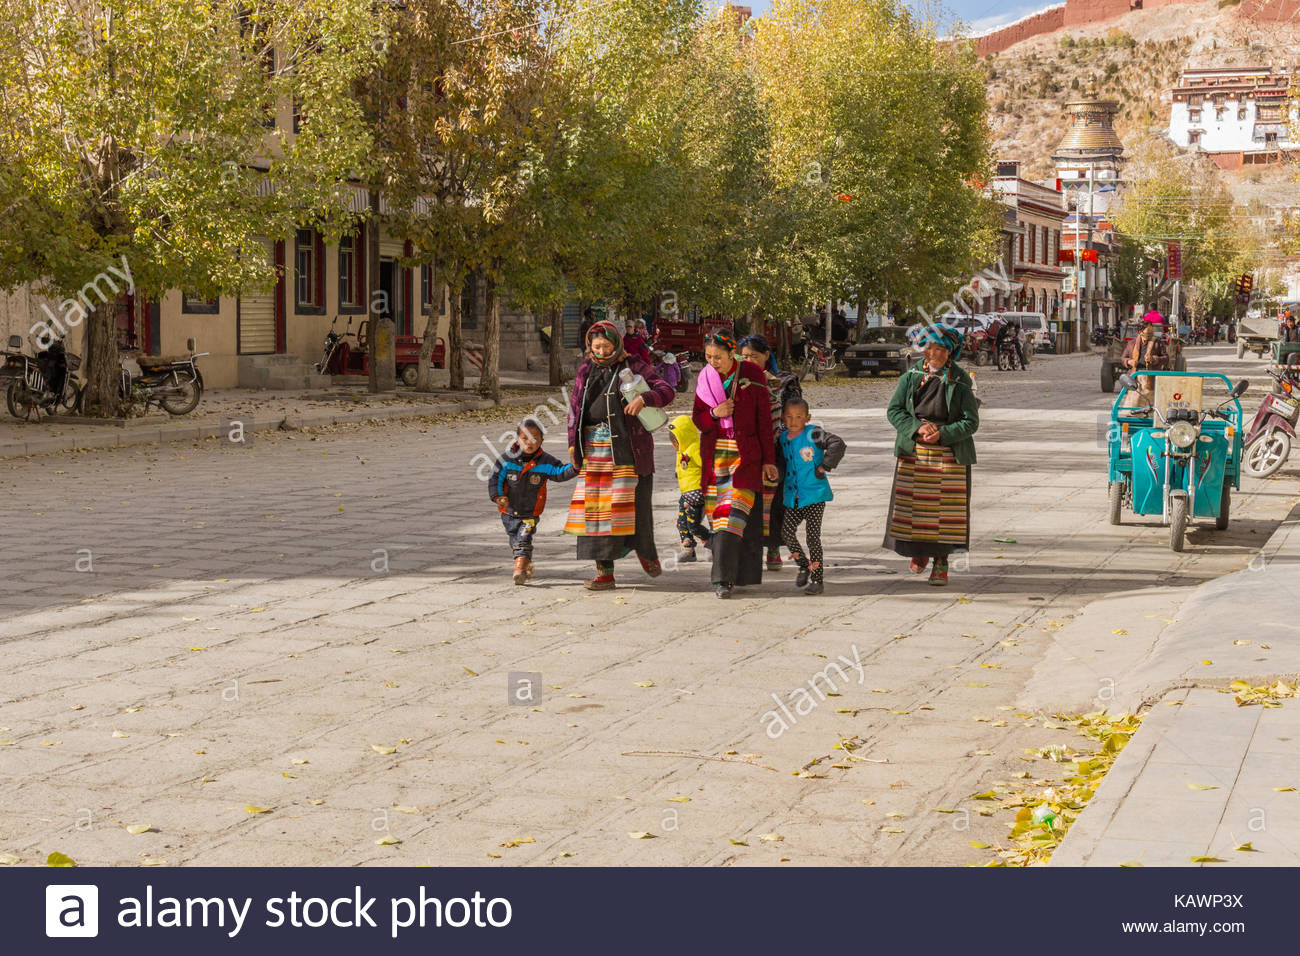 Tibetan Family walking on the main street in Gyantse, Tibet - Stock Image